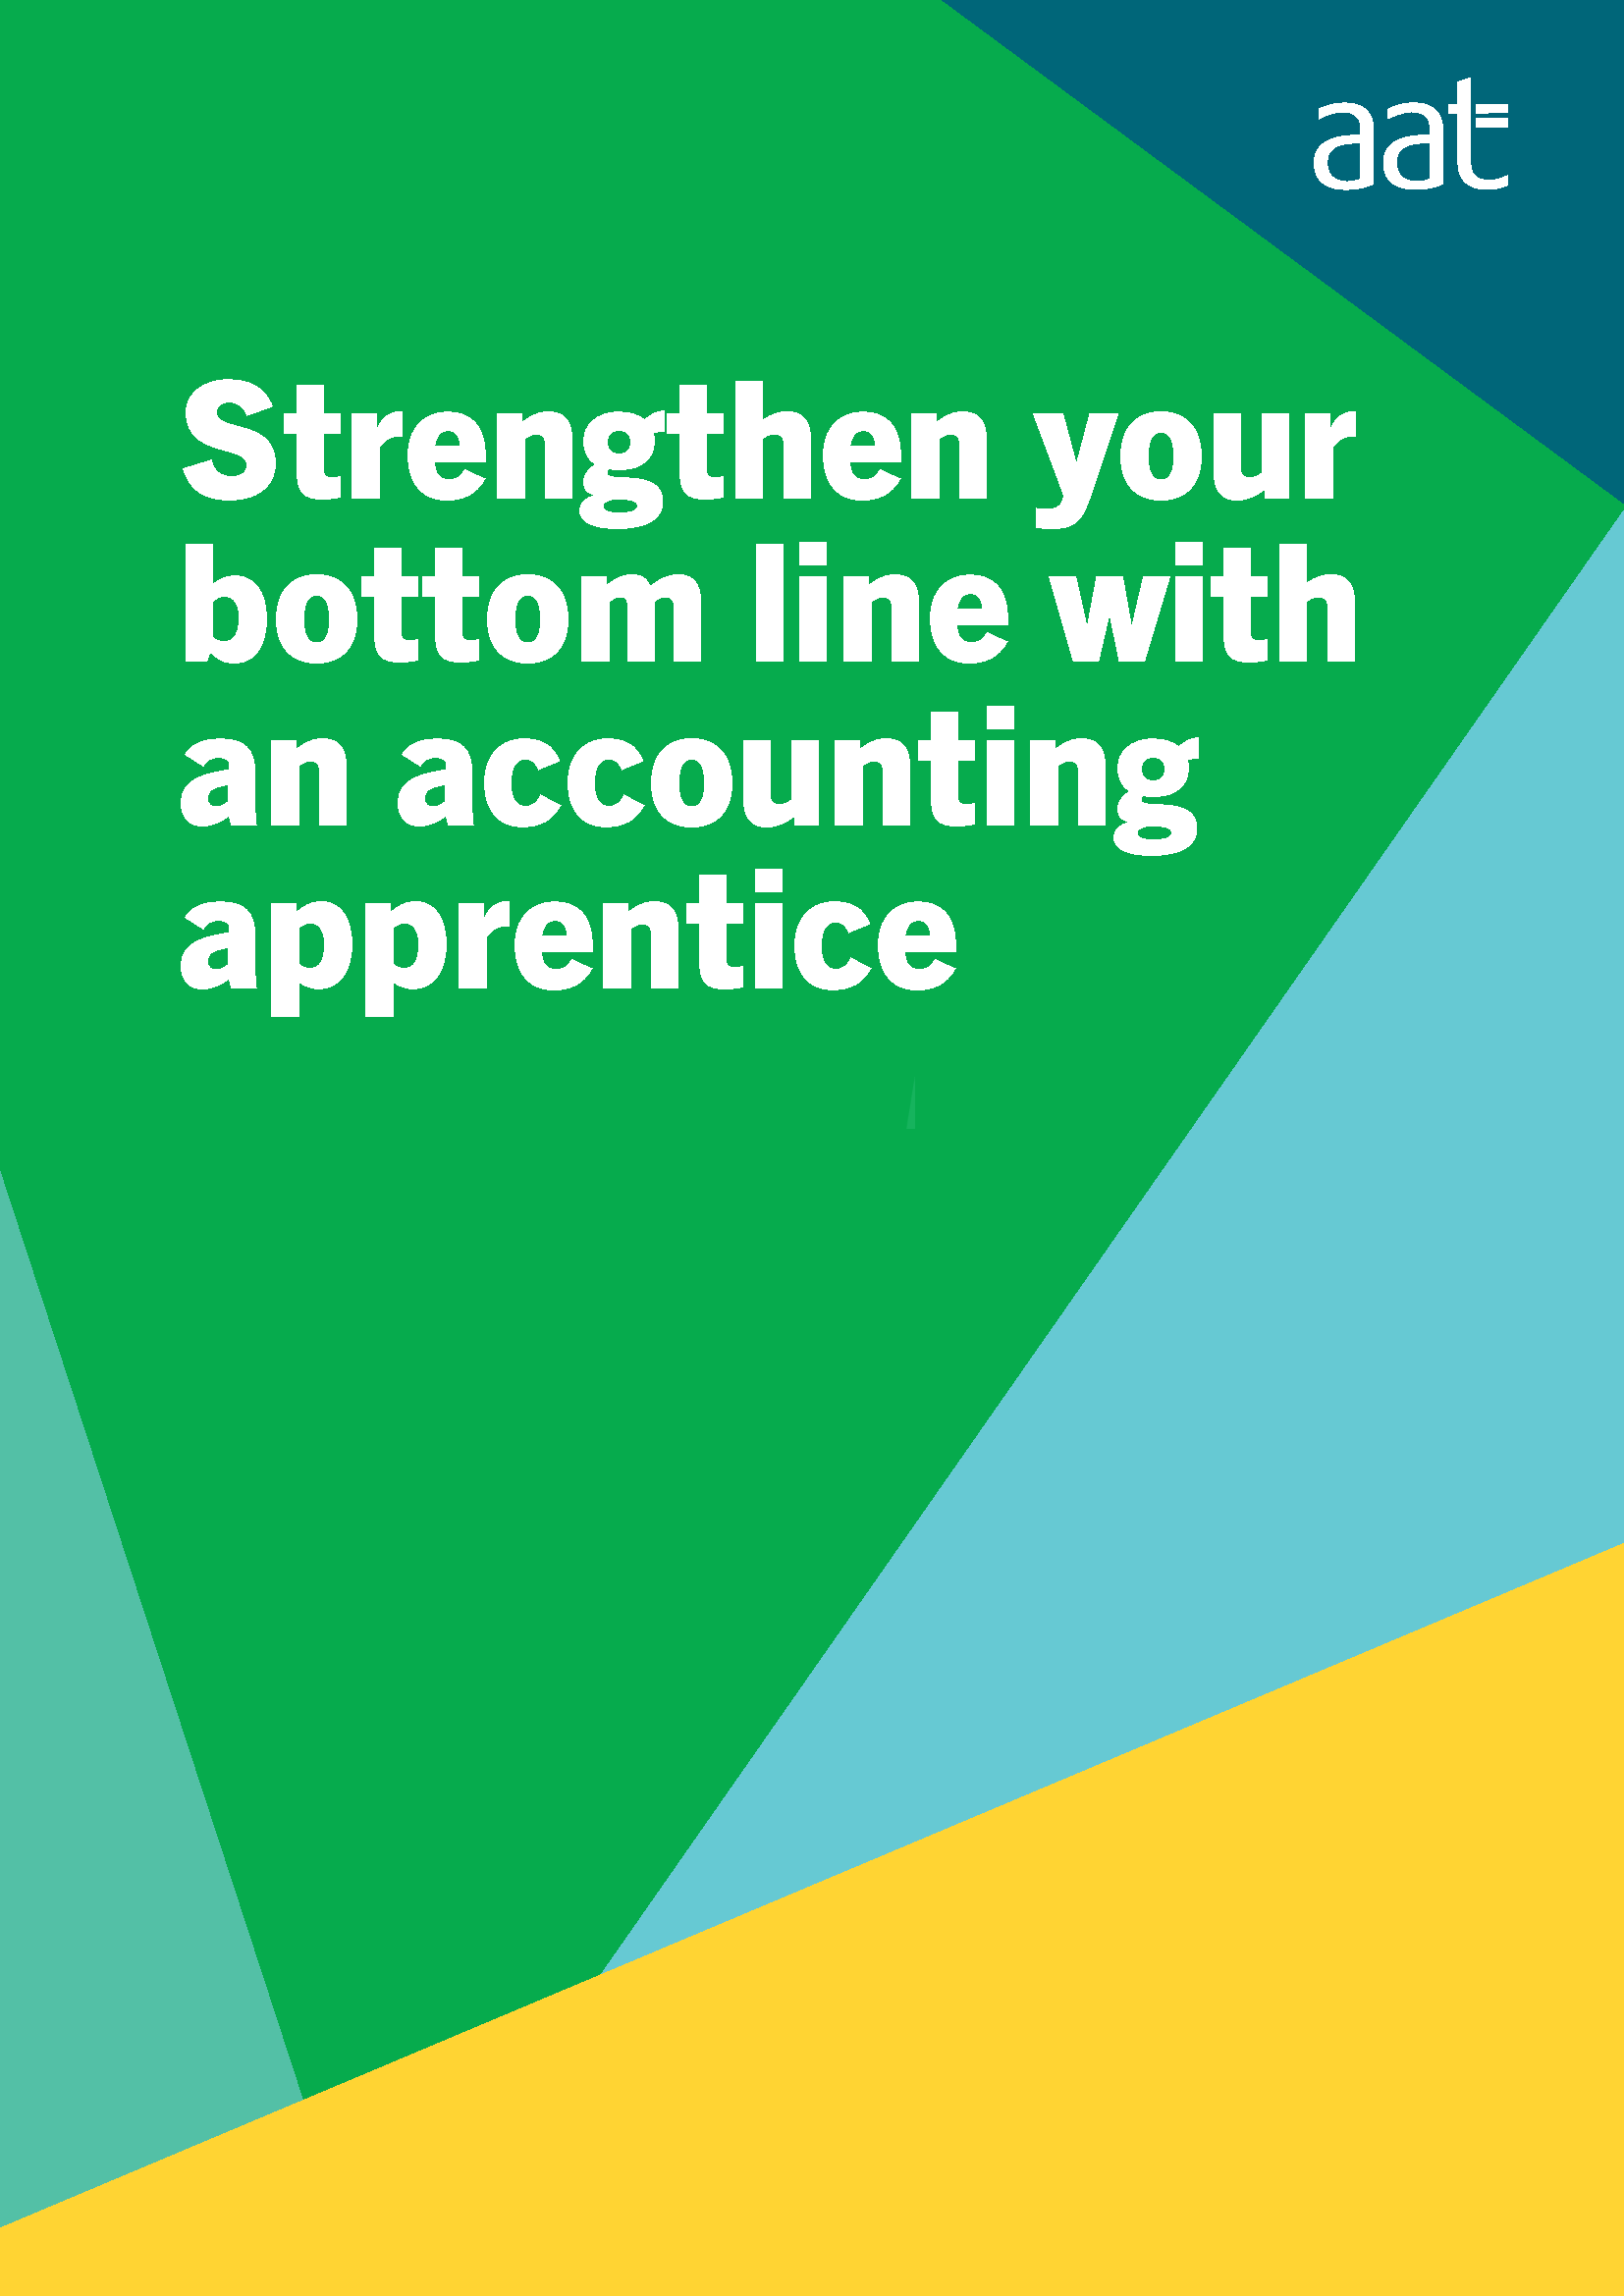 AAT Apprenticeship ebook_SME_no button